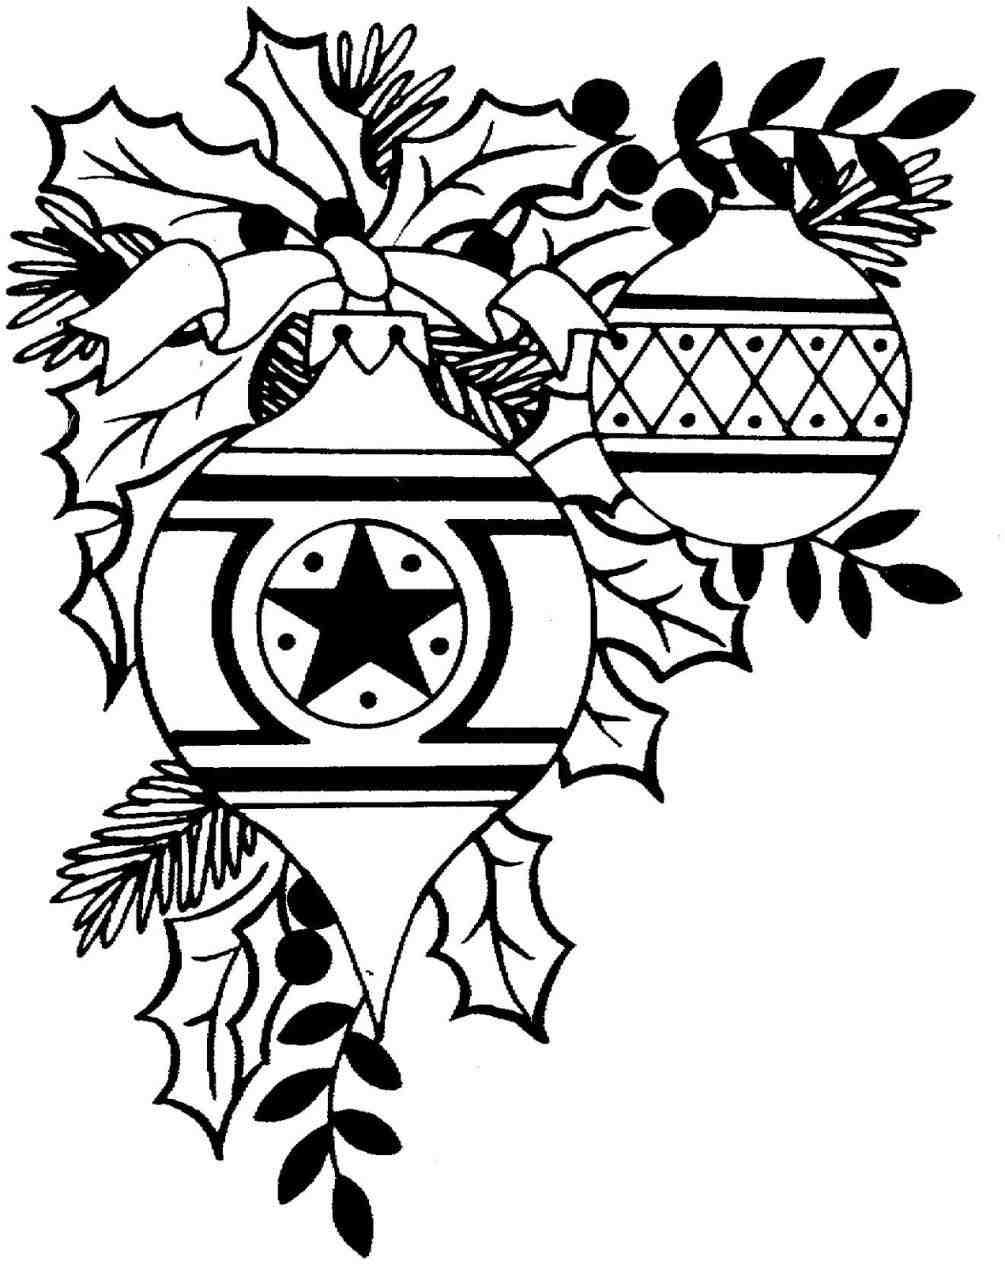 1005x1264 Religious Merry Christmas Clip Art Black And White Cheminee.website